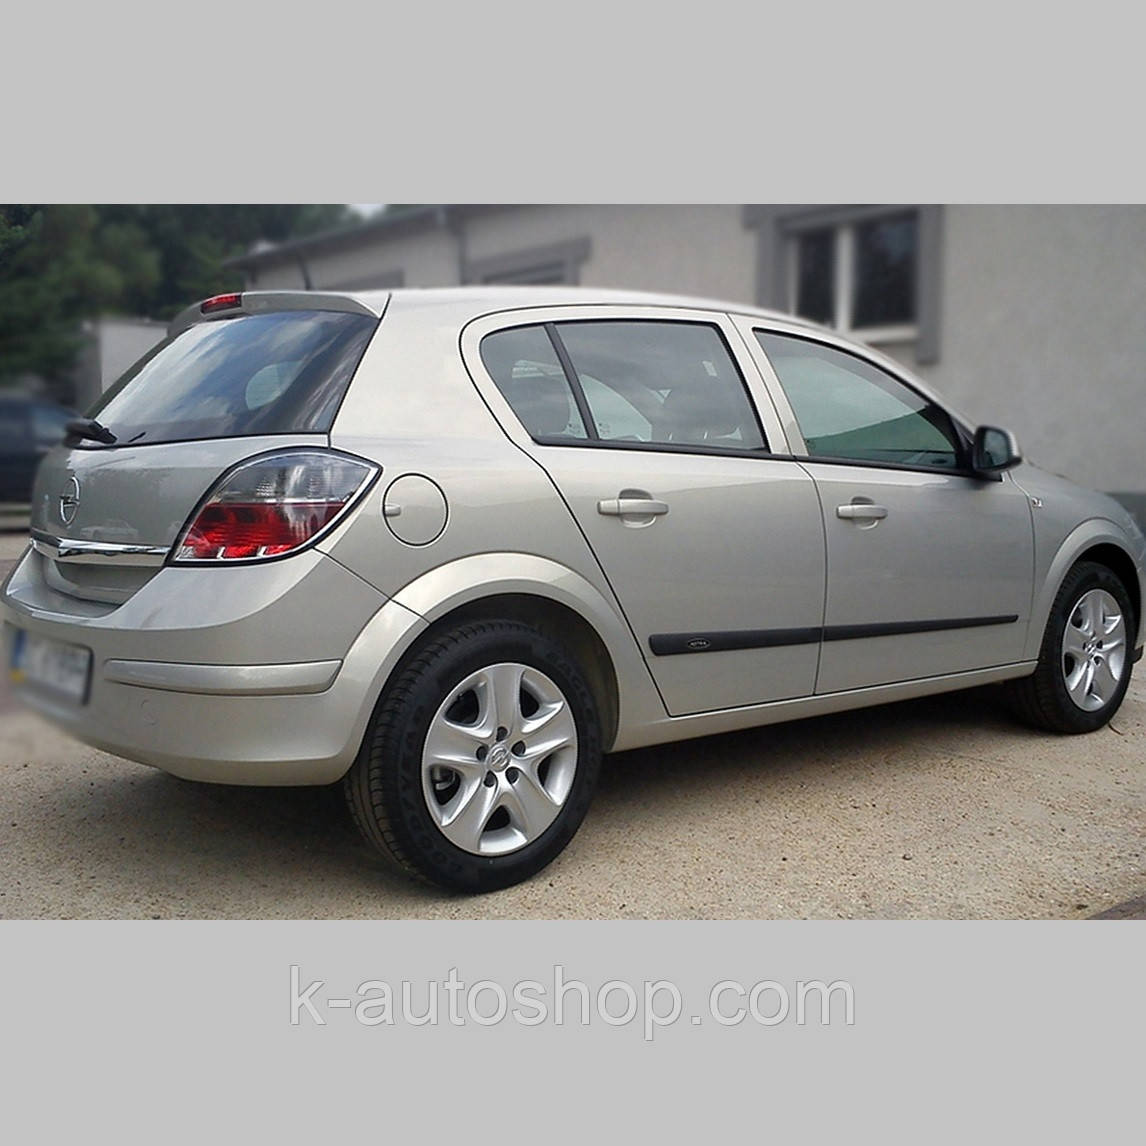 Молдинги на двері для Opel Astra H 5dr хетчбек, 4dr сєдан 2004-2014